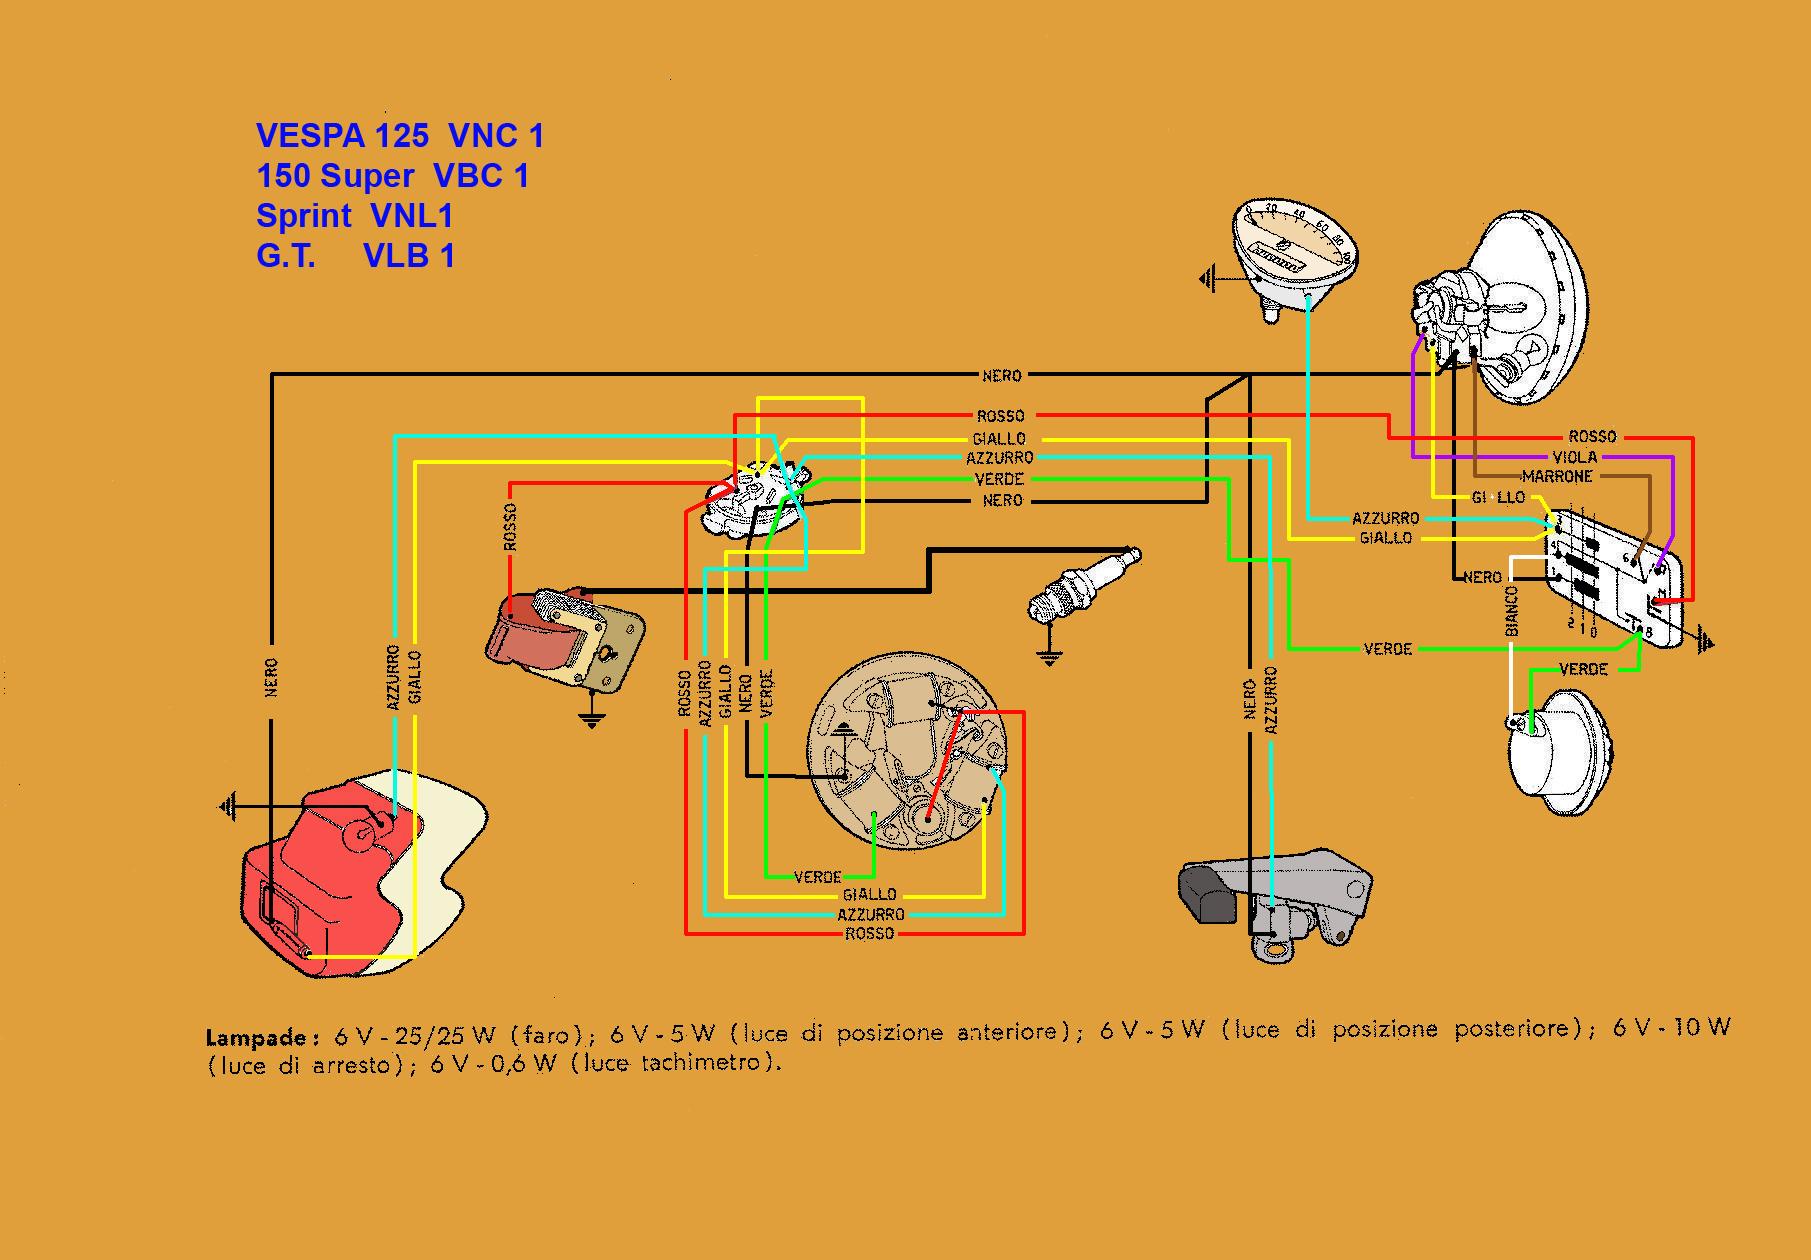 Schema Elettrico Vespa Px 125 : Schema elettrico vespa  vnc vbc vnl vlb